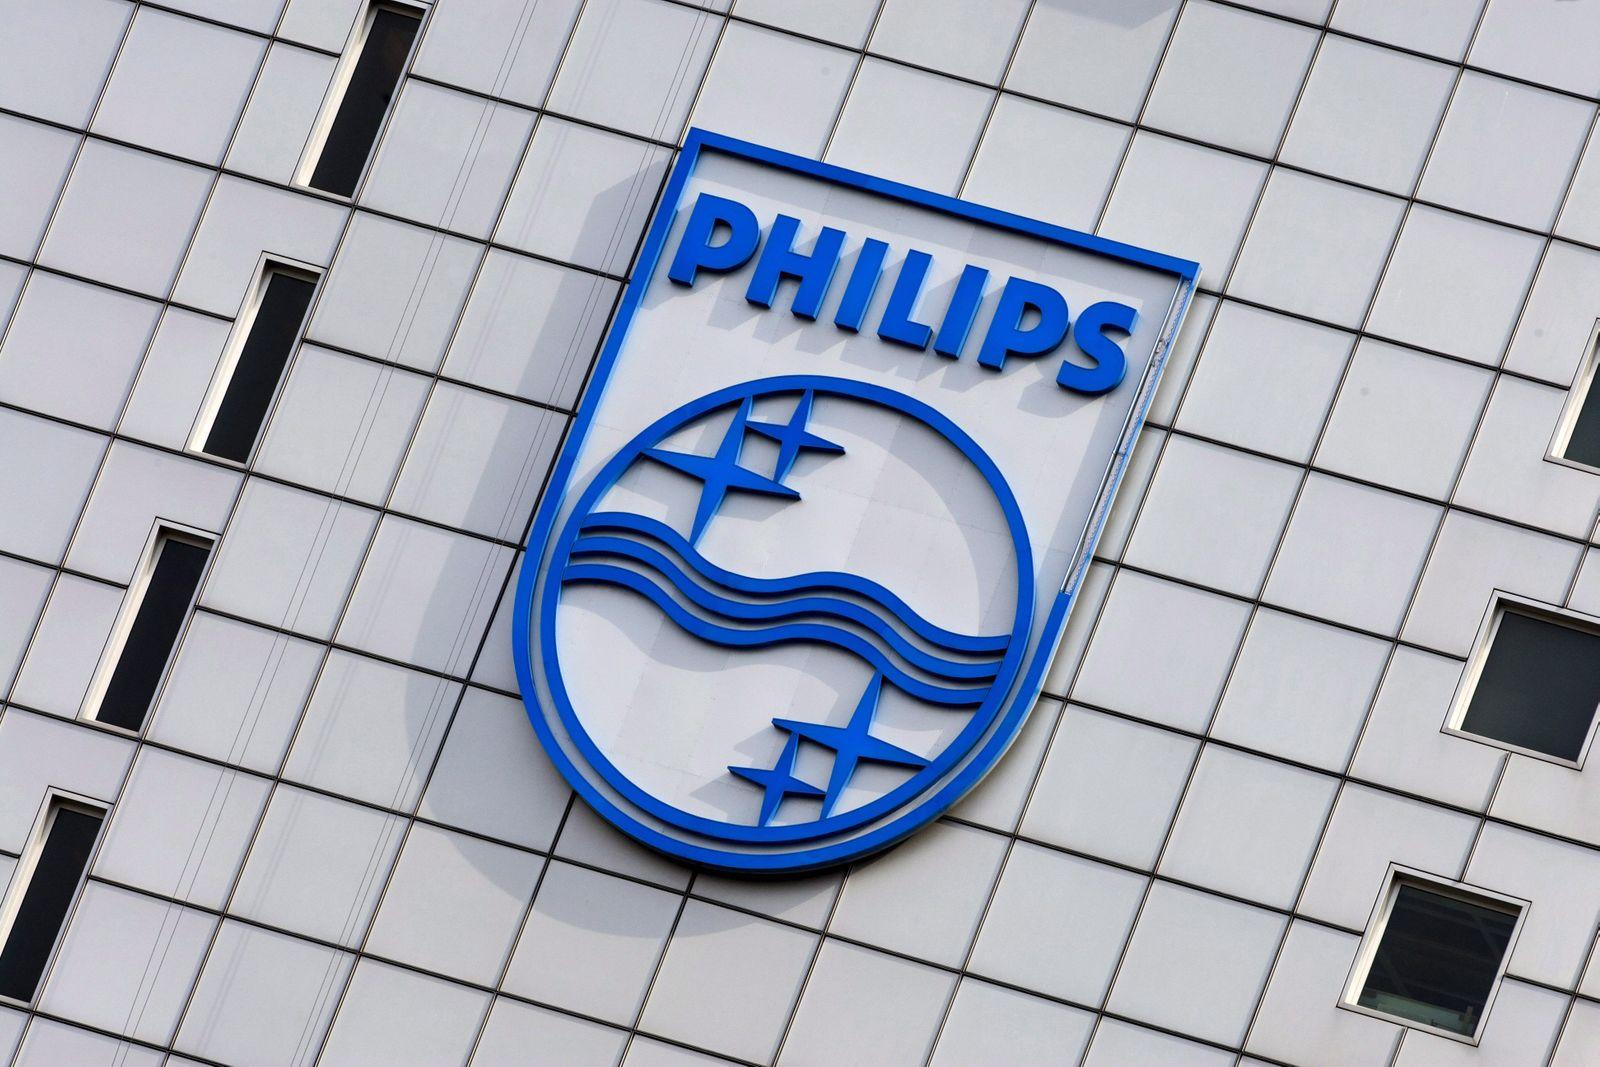 Philips / Firmenschild / Zentrale in Amsterdam